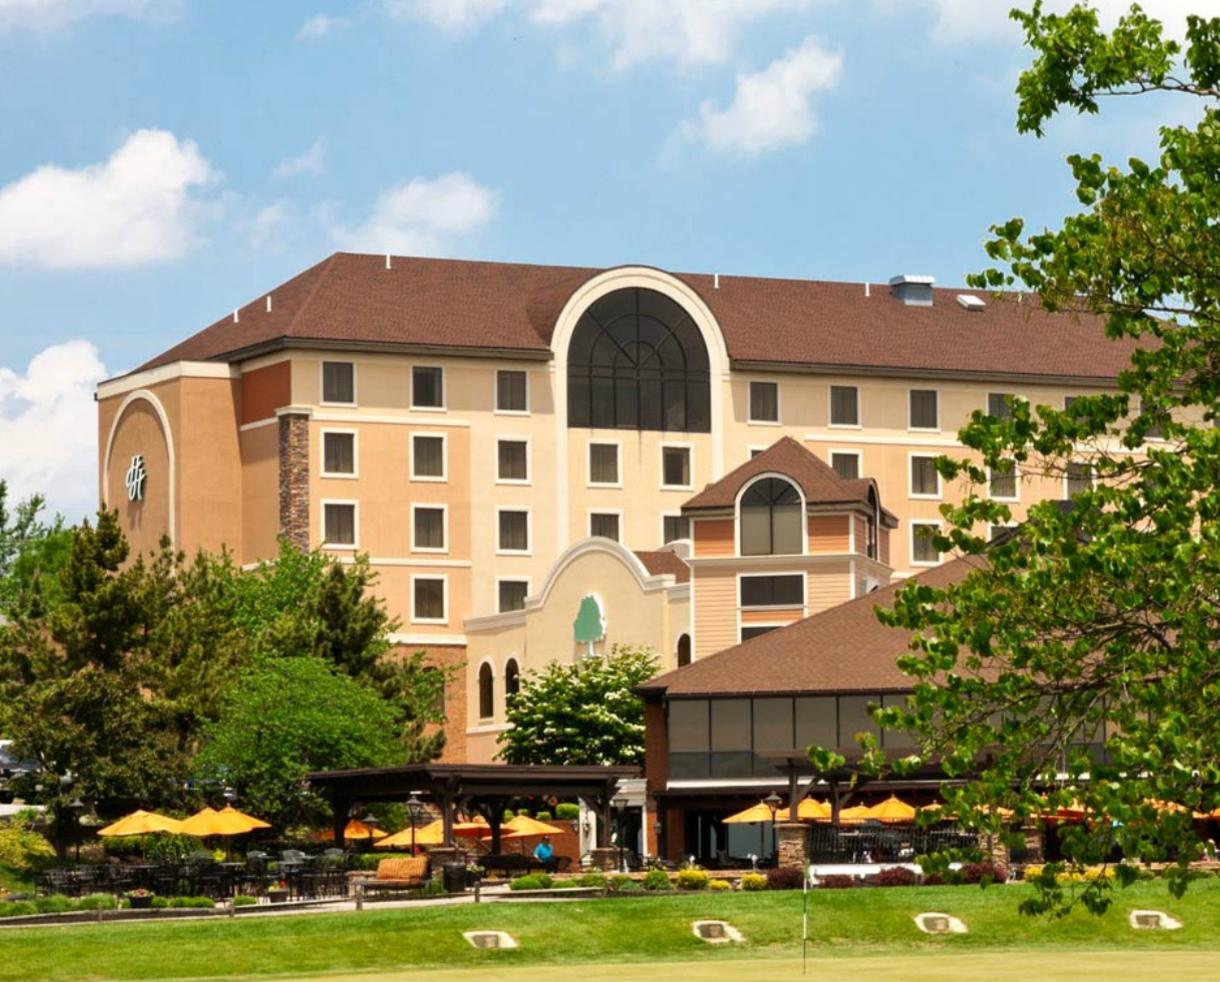 Heritage Hills Hotel York Pa